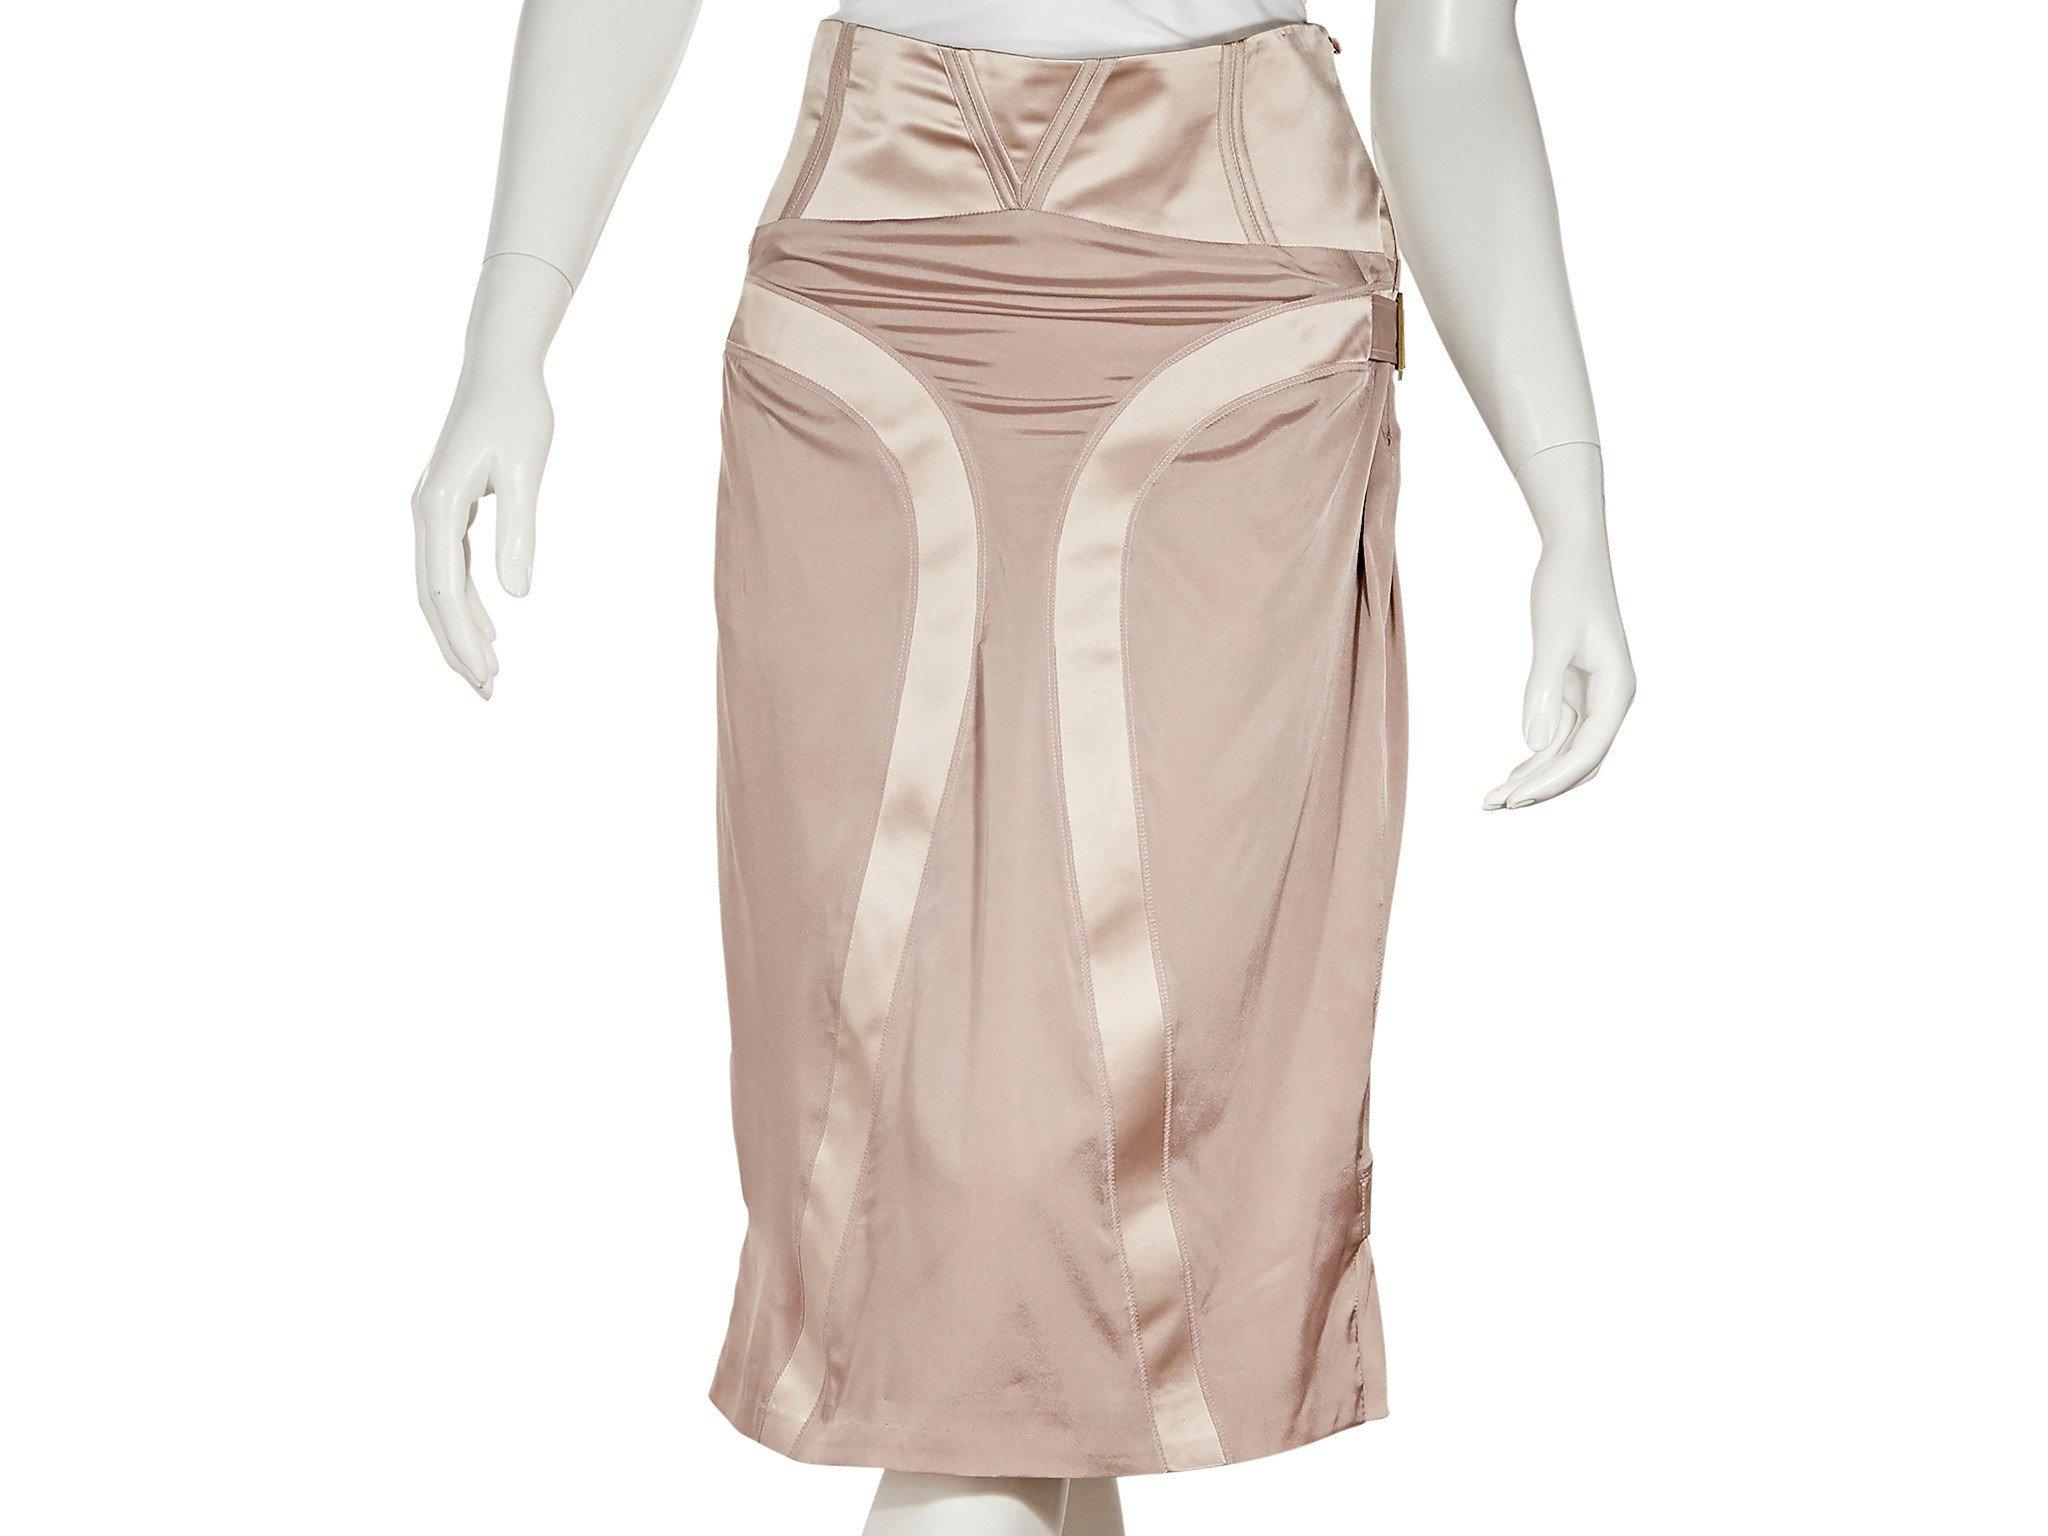 GUCCI Light Pink Gucci Silk Pencil Skirt;Size: 8 US; $985